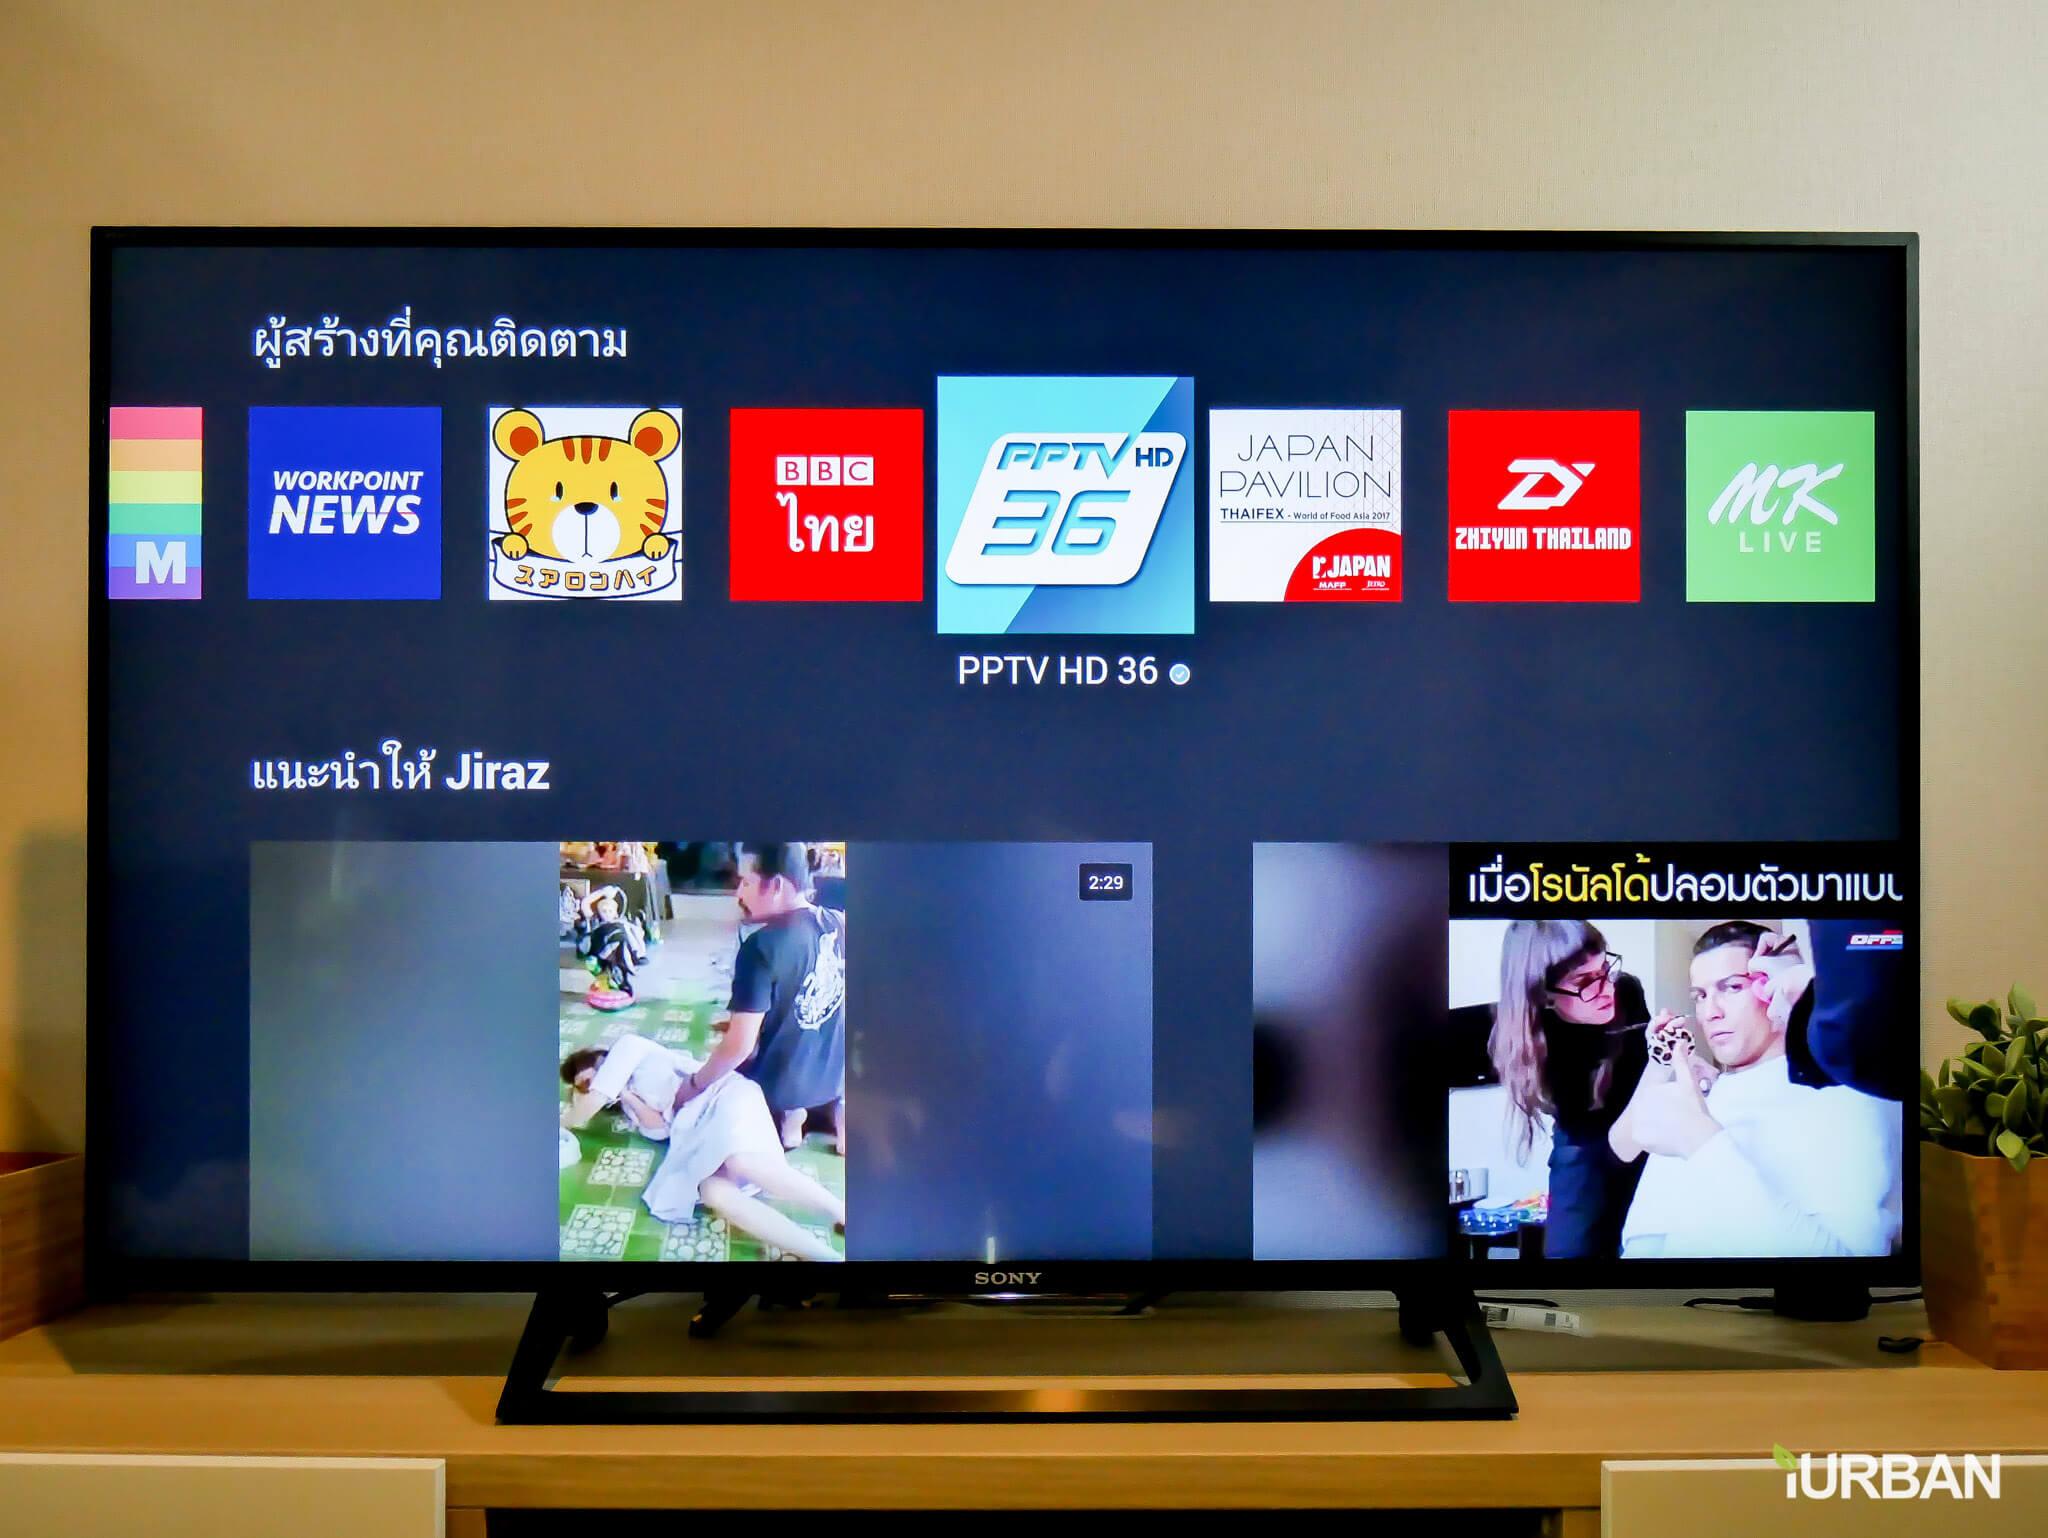 %name รีวิว SONY Android TV รุ่น X8000E งบ 26,990 แต่สเปค 4K HDR เชื่อมโลก Social กับทีวีอย่างสมบูรณ์แบบ